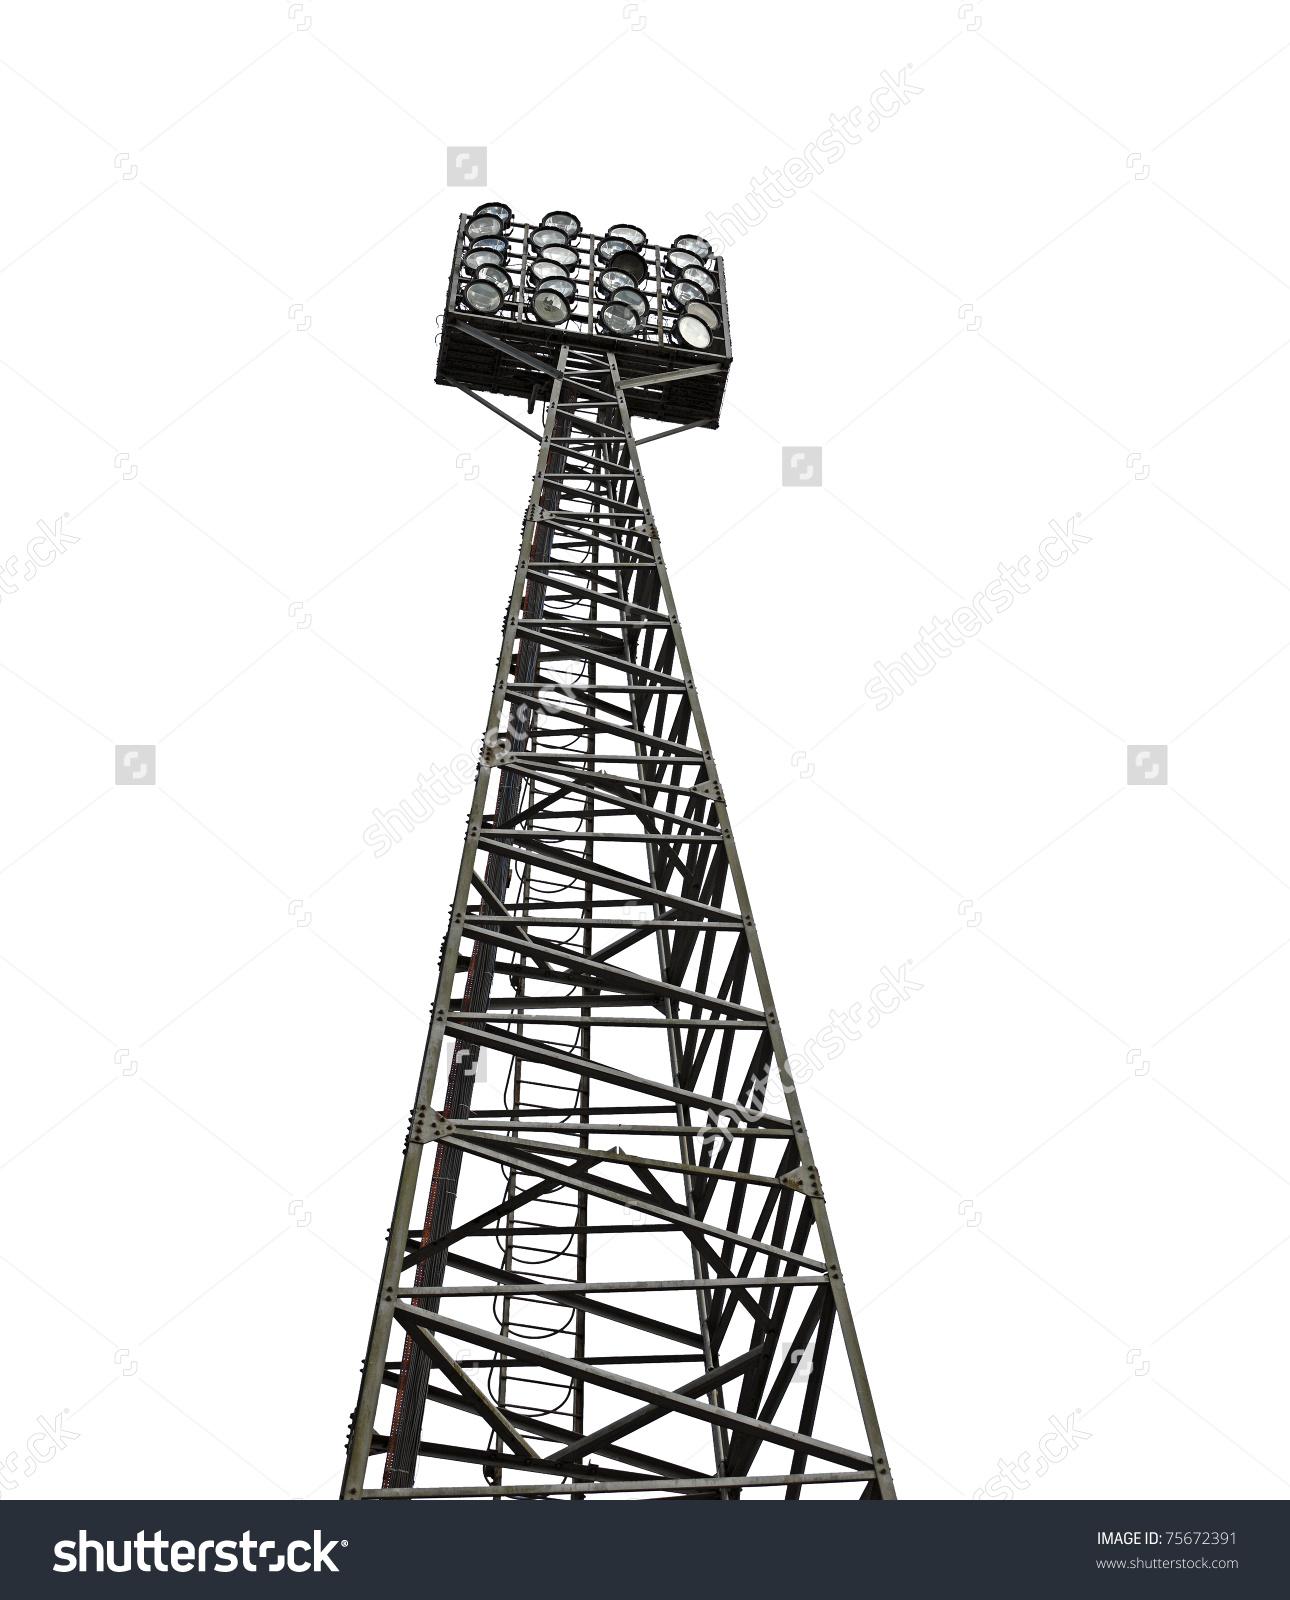 Stadium Floodlight Metal Tower Rows Halogen Stock Photo 75672391.